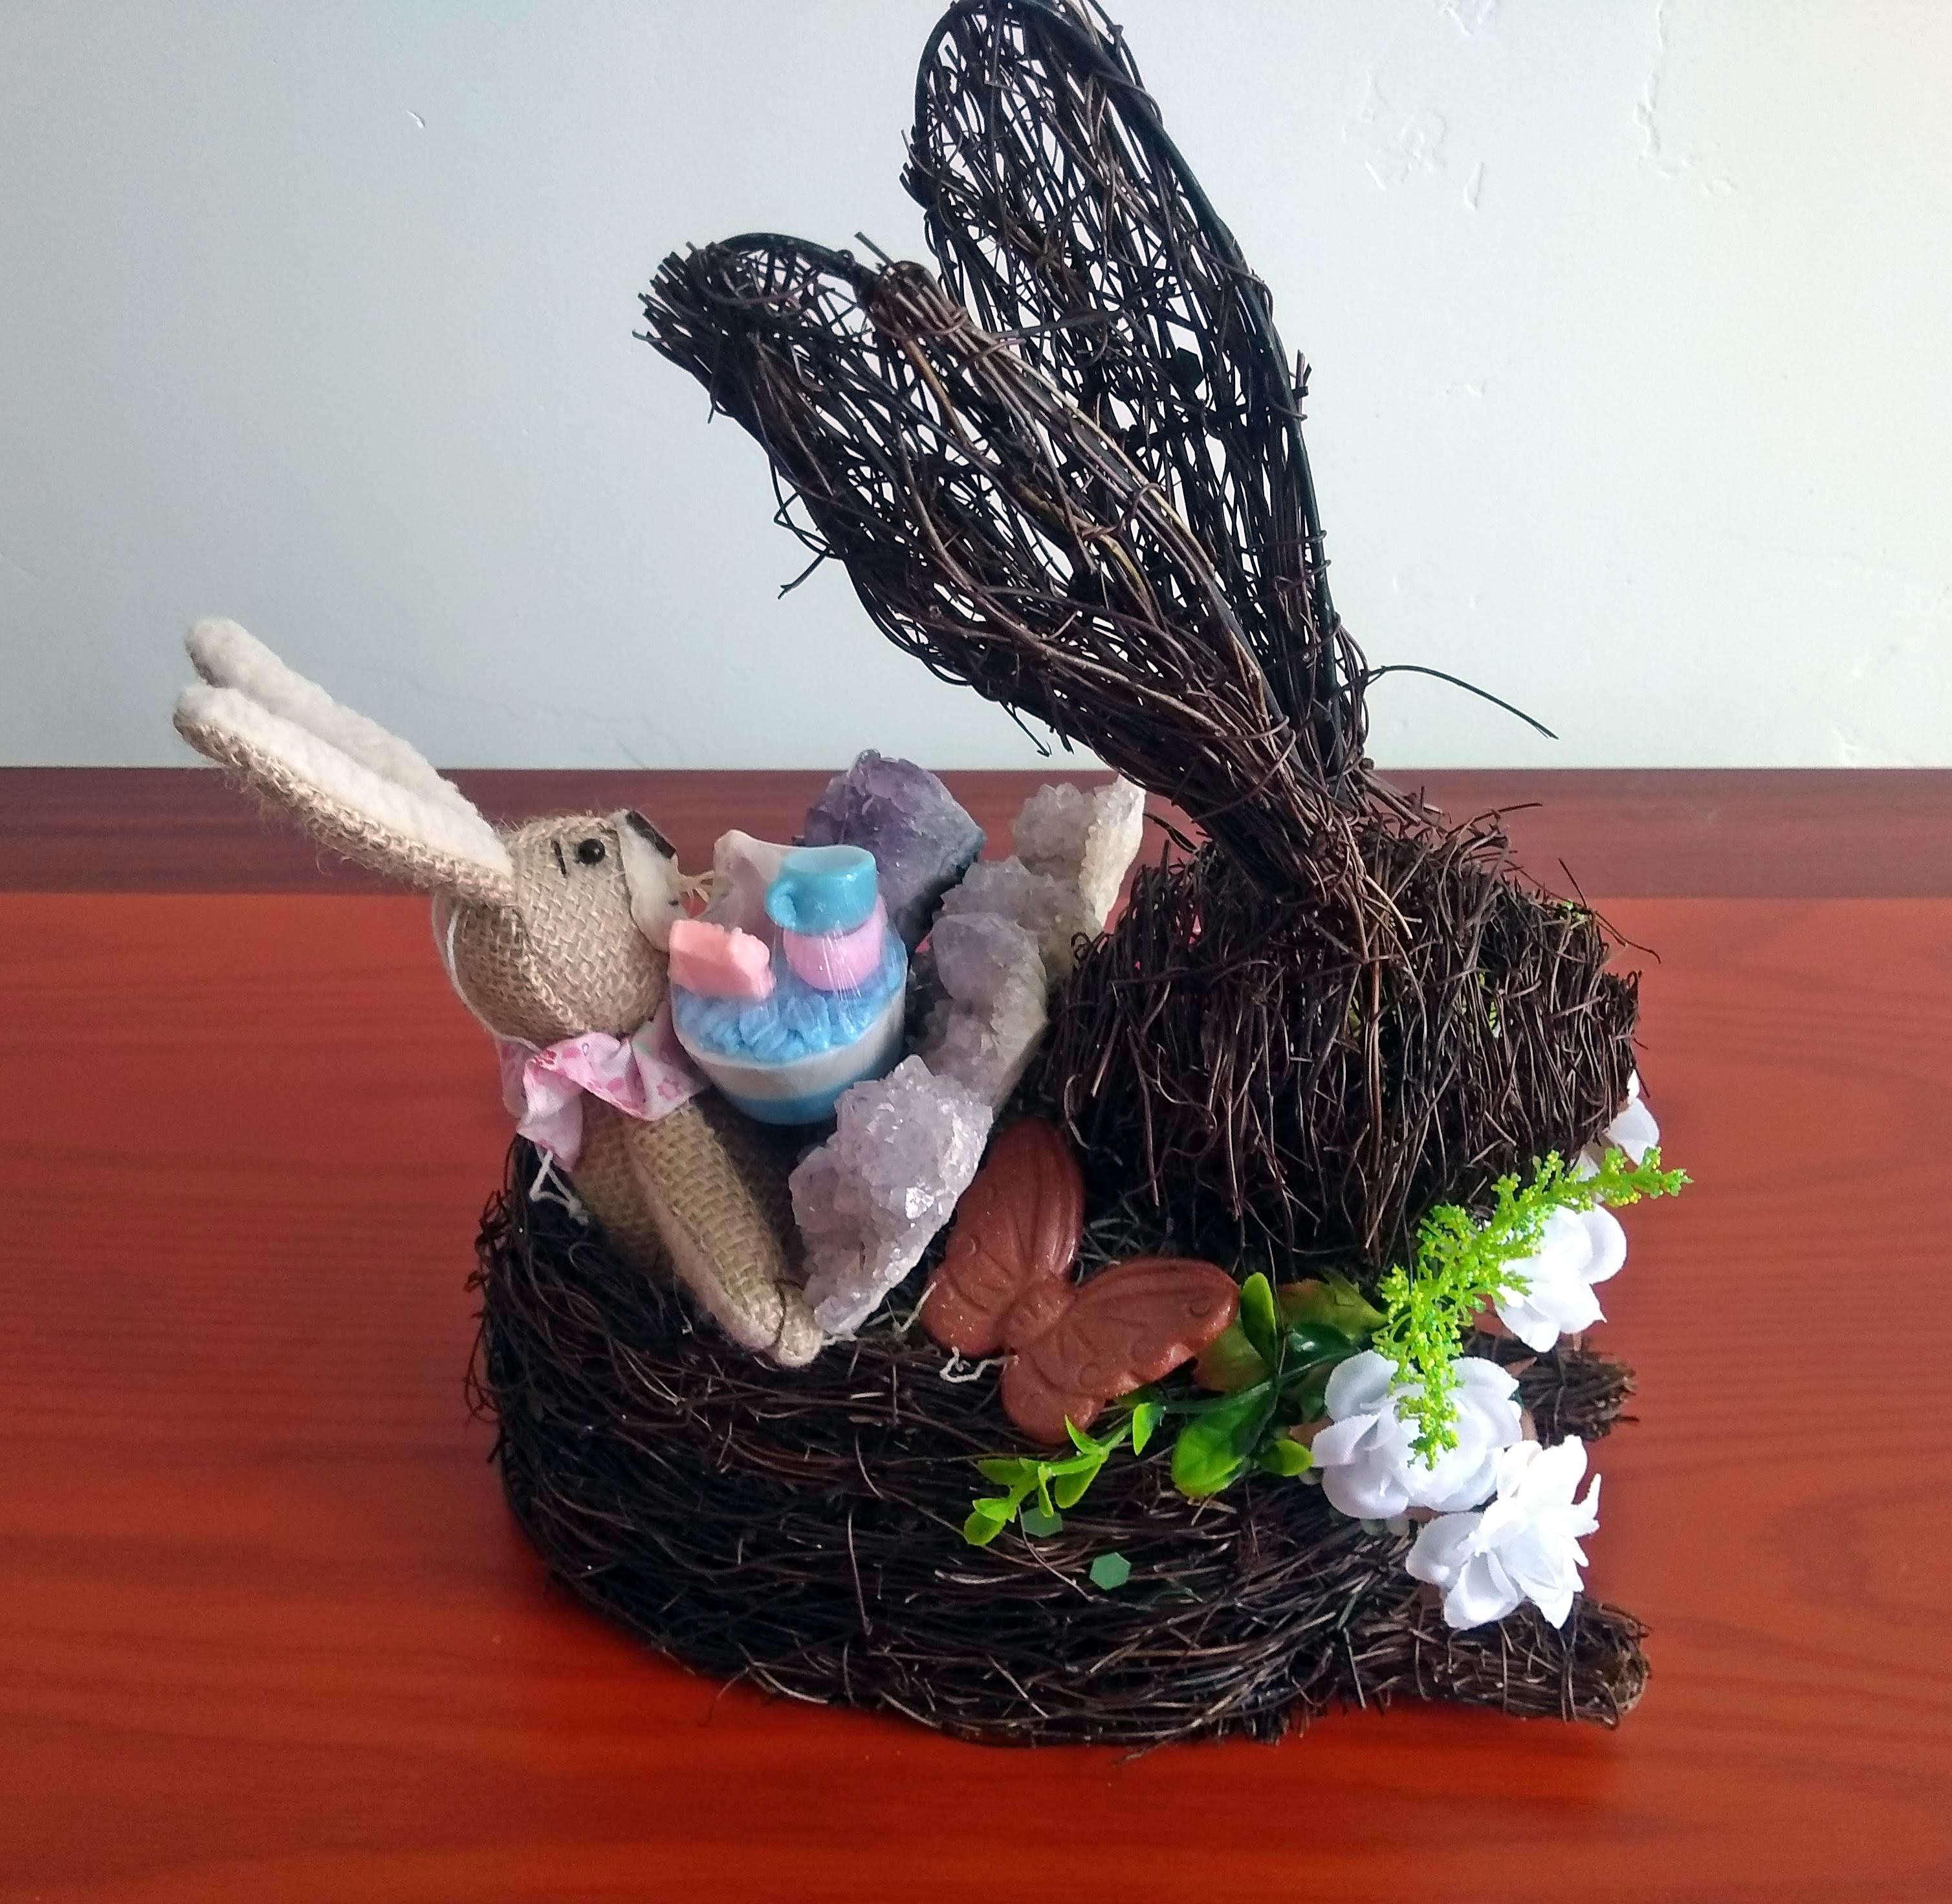 rabbit basket2 (2)